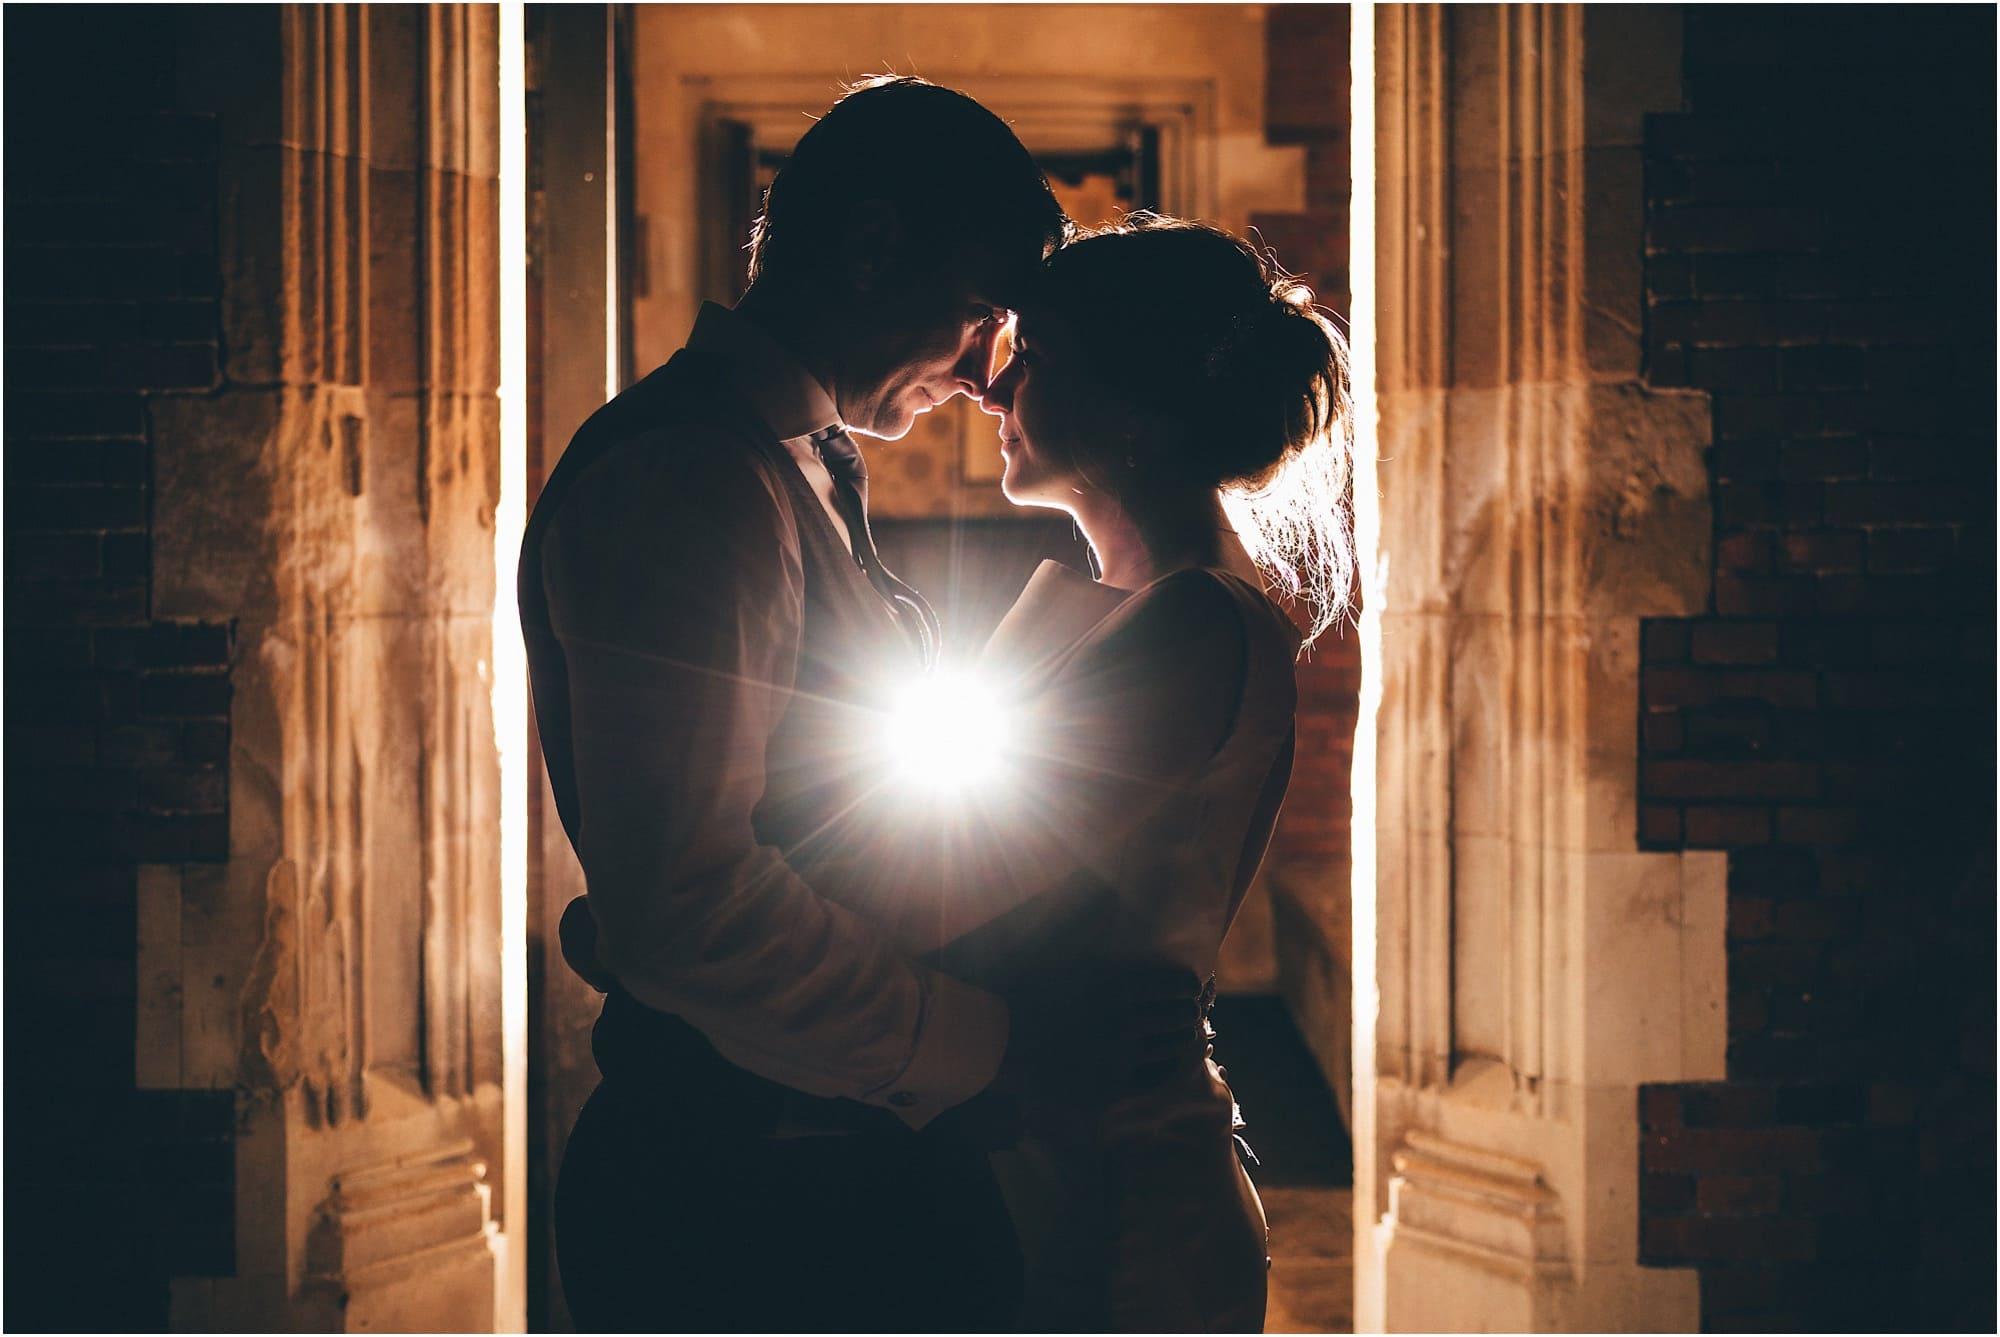 Romantic photo of bride and groom